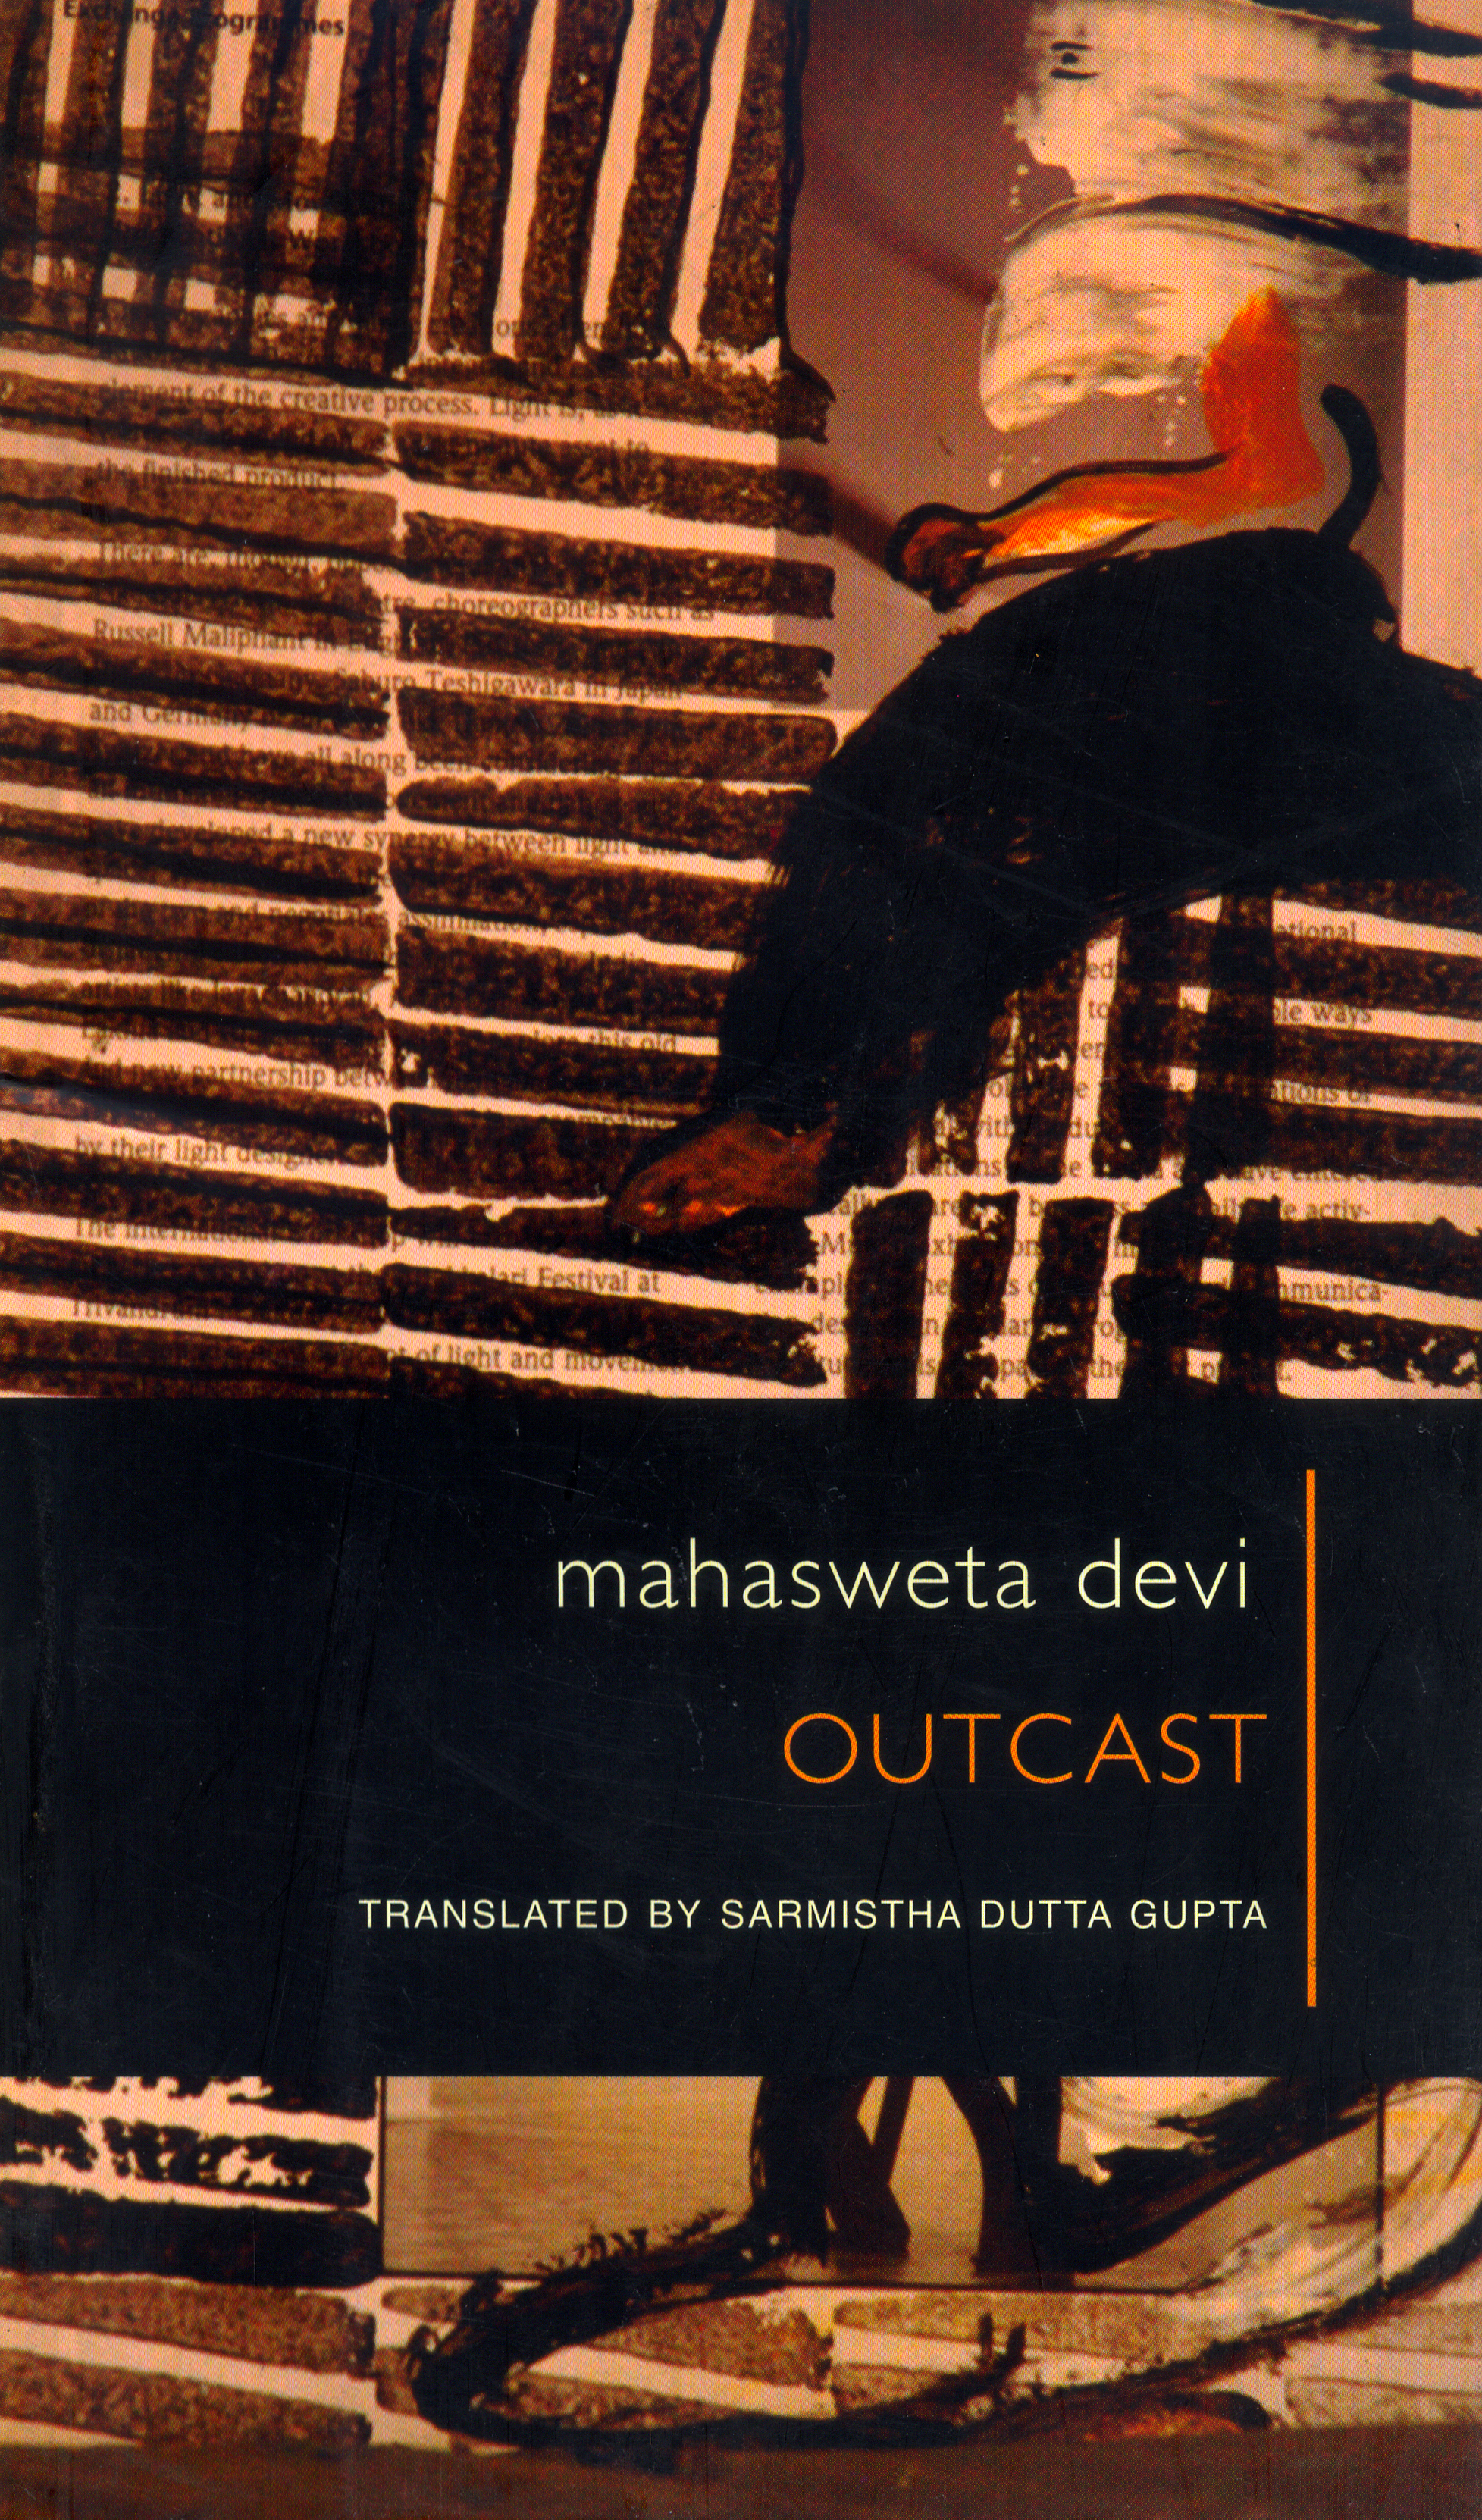 Outcast by Mahasweta Devi | Seagull Books